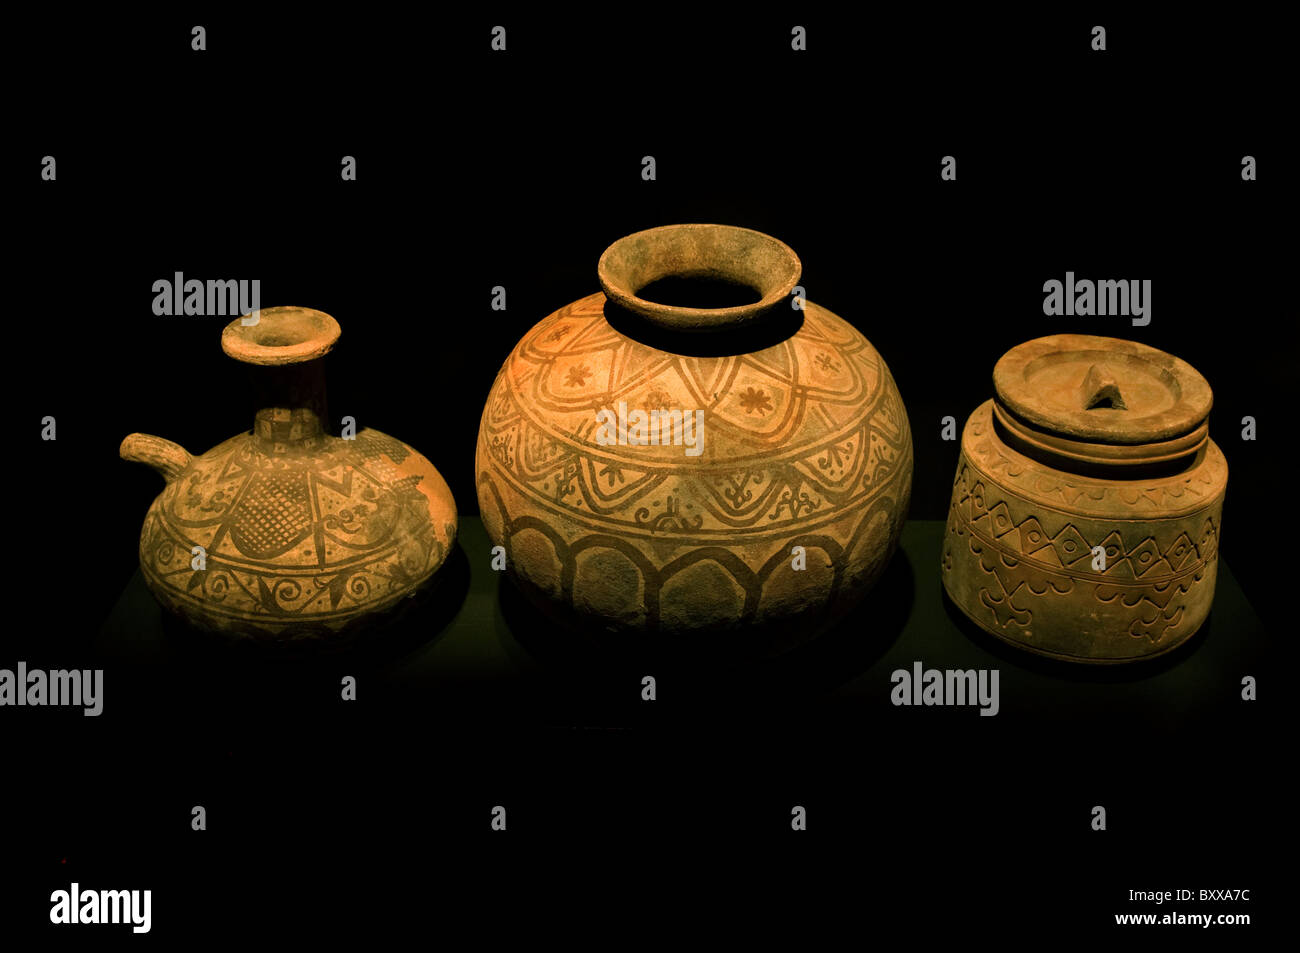 Indonesia Indonesian Banda Maluku Tengah earthenware pots Kai Islands before 1900 - Stock Image